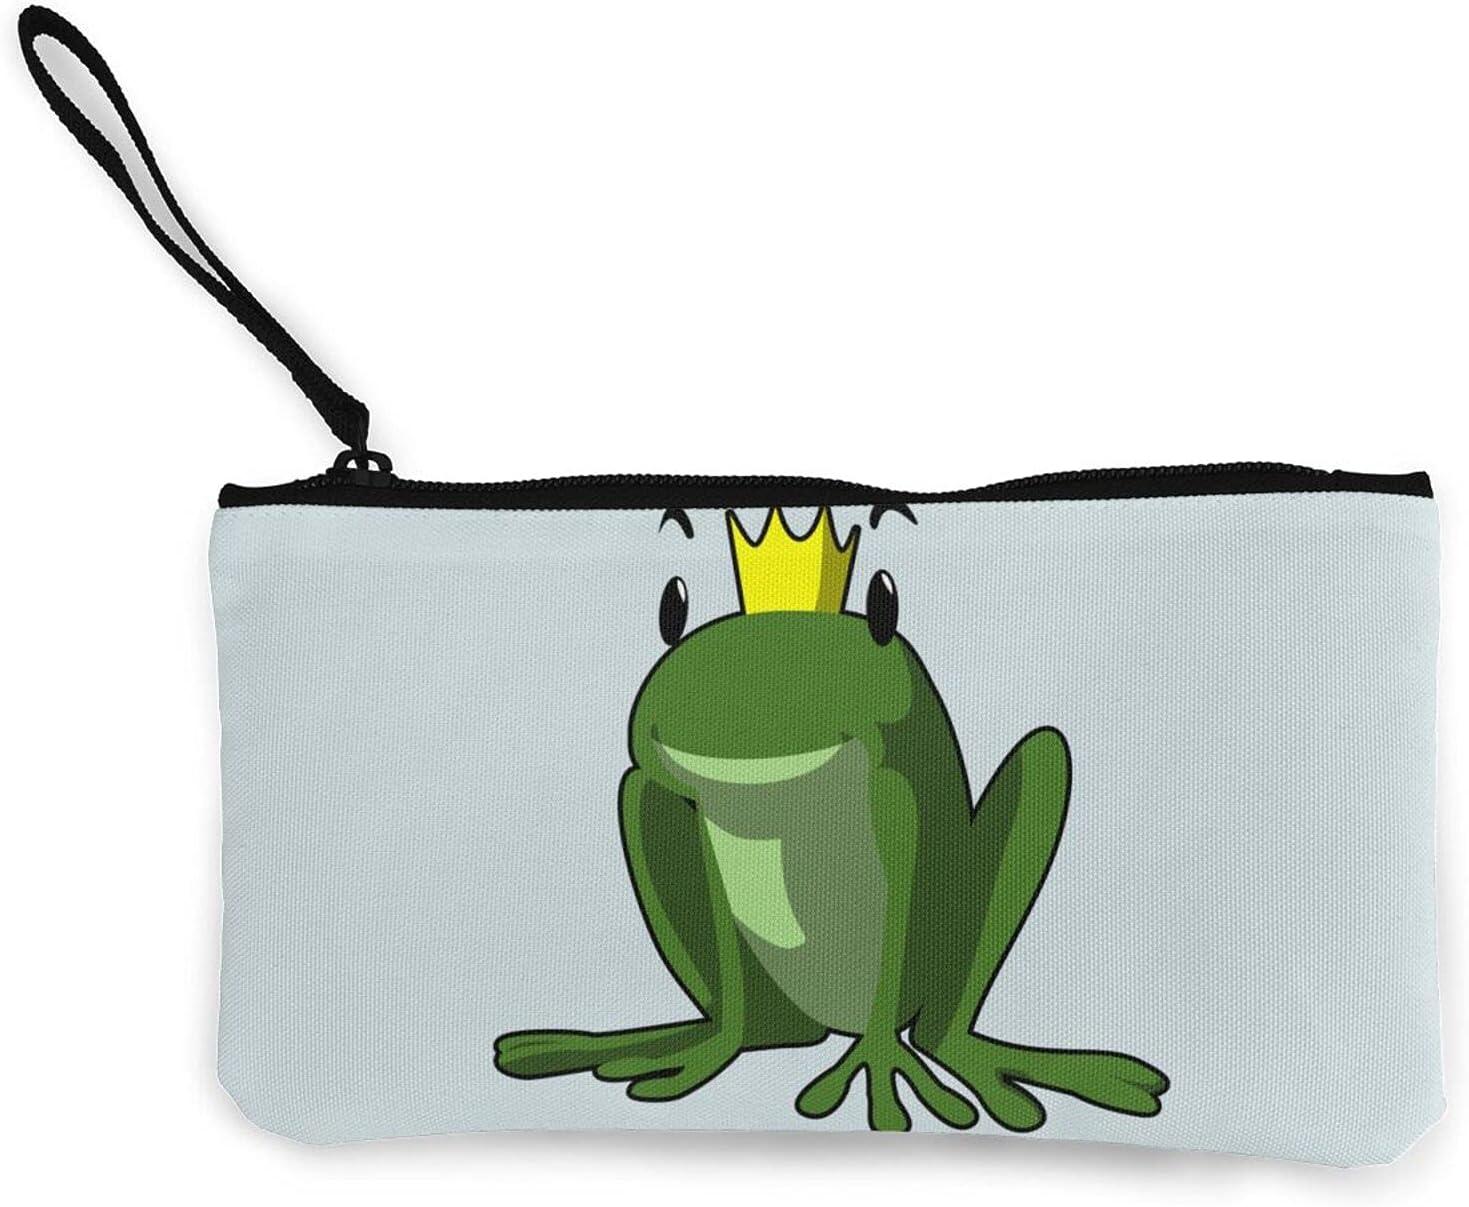 AORRUAM Frog Prince Crown Canvas Coin Purse,Canvas Zipper Pencil Cases,Canvas Change Purse Pouch Mini Wallet Coin Bag